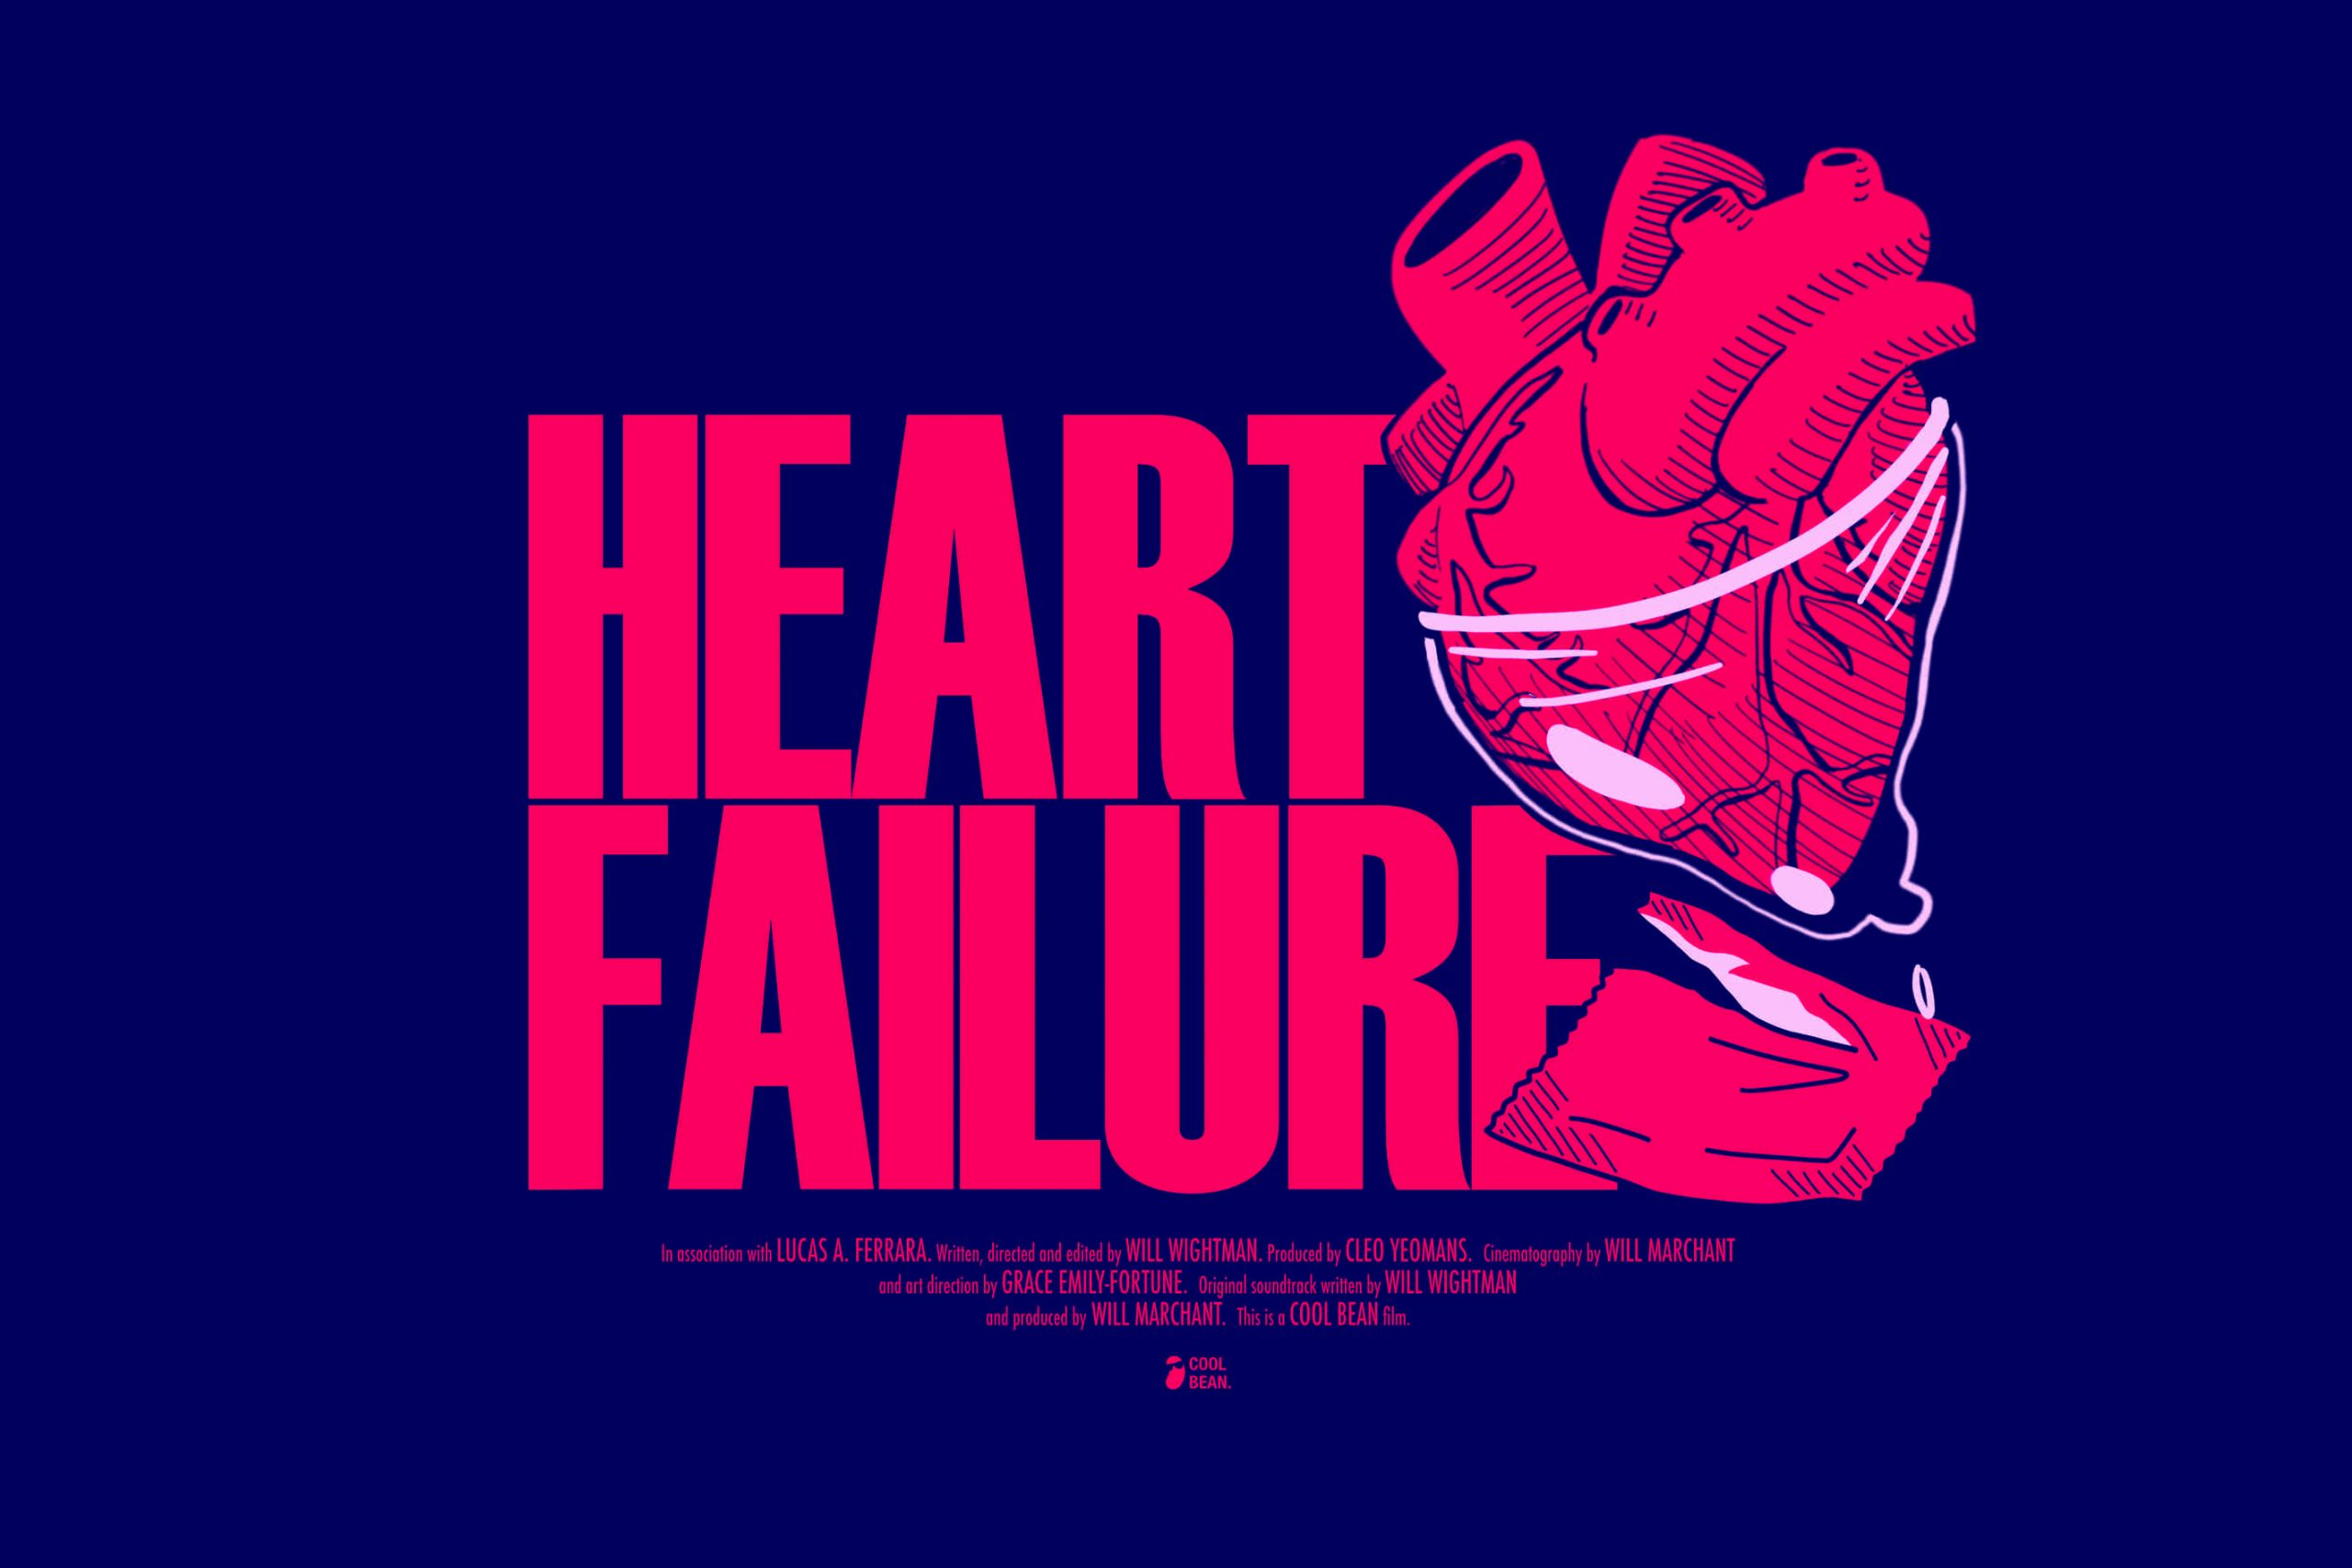 HEARTFAILURE Poster